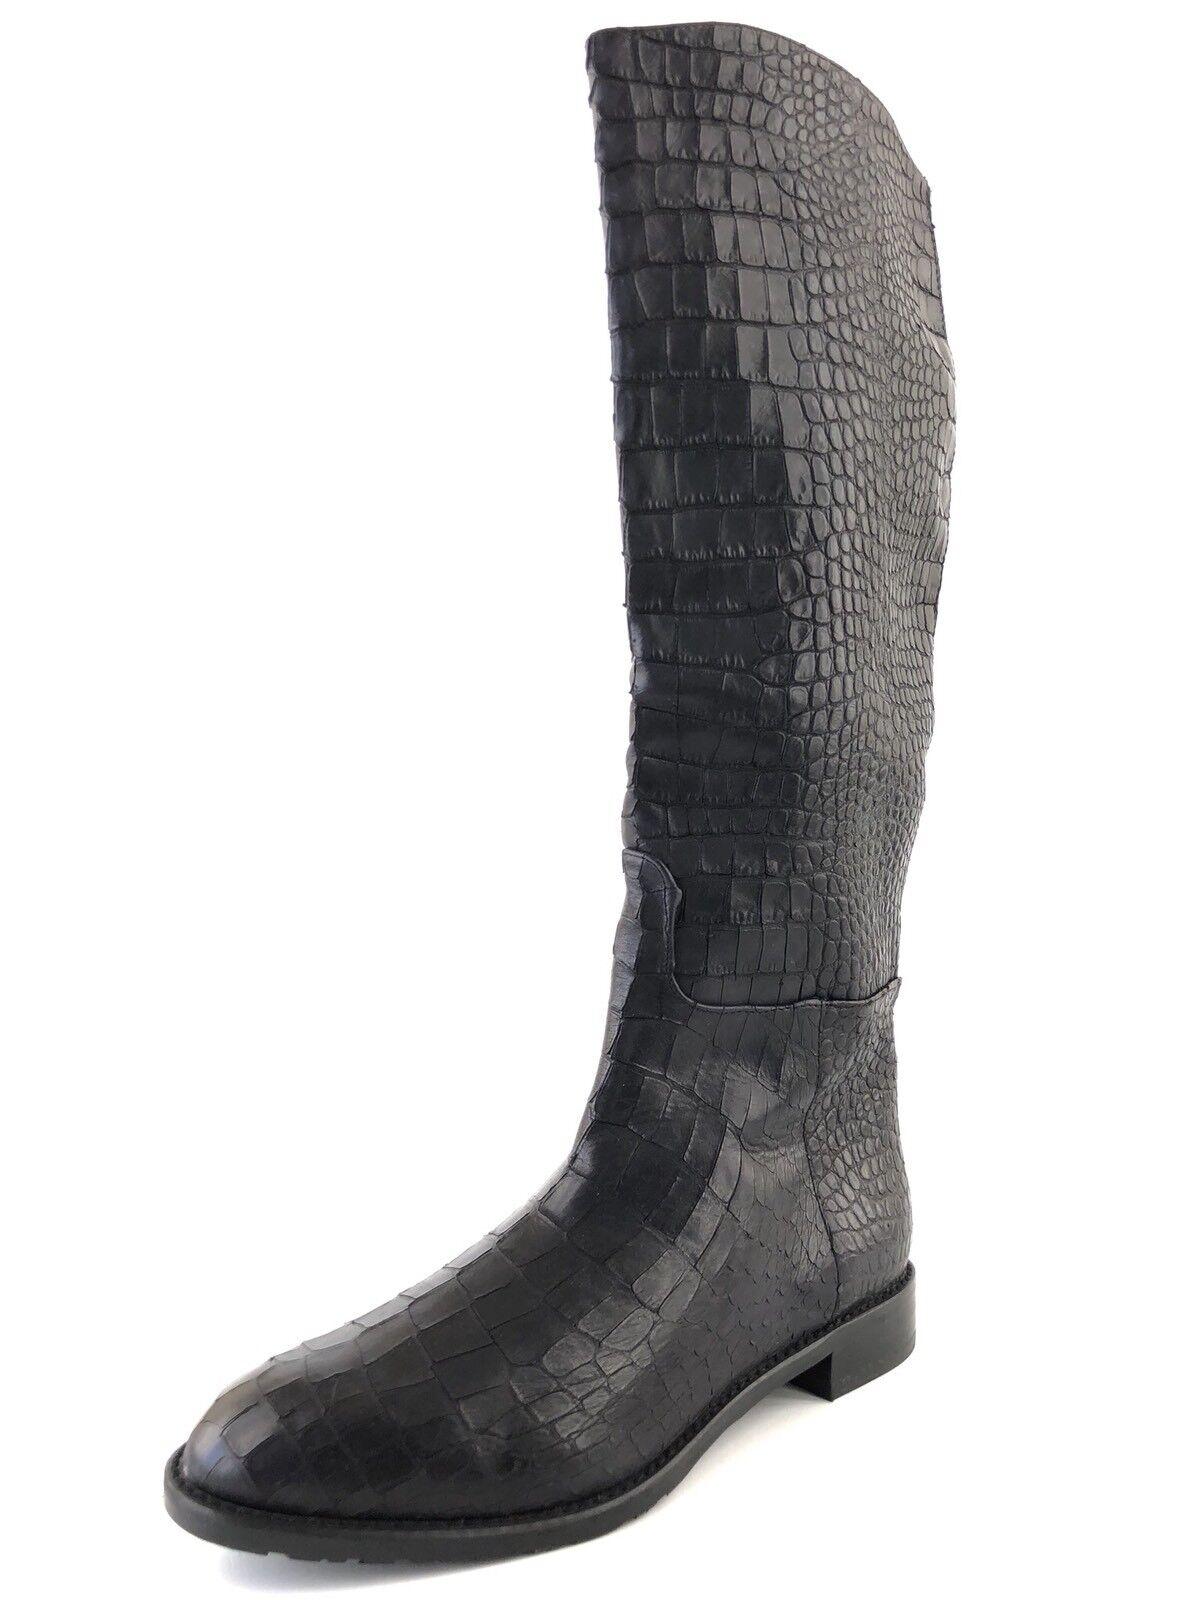 $798 Stuart Weitzman Wayback Black Leather Knee High Boots Womens Size 35.5 M